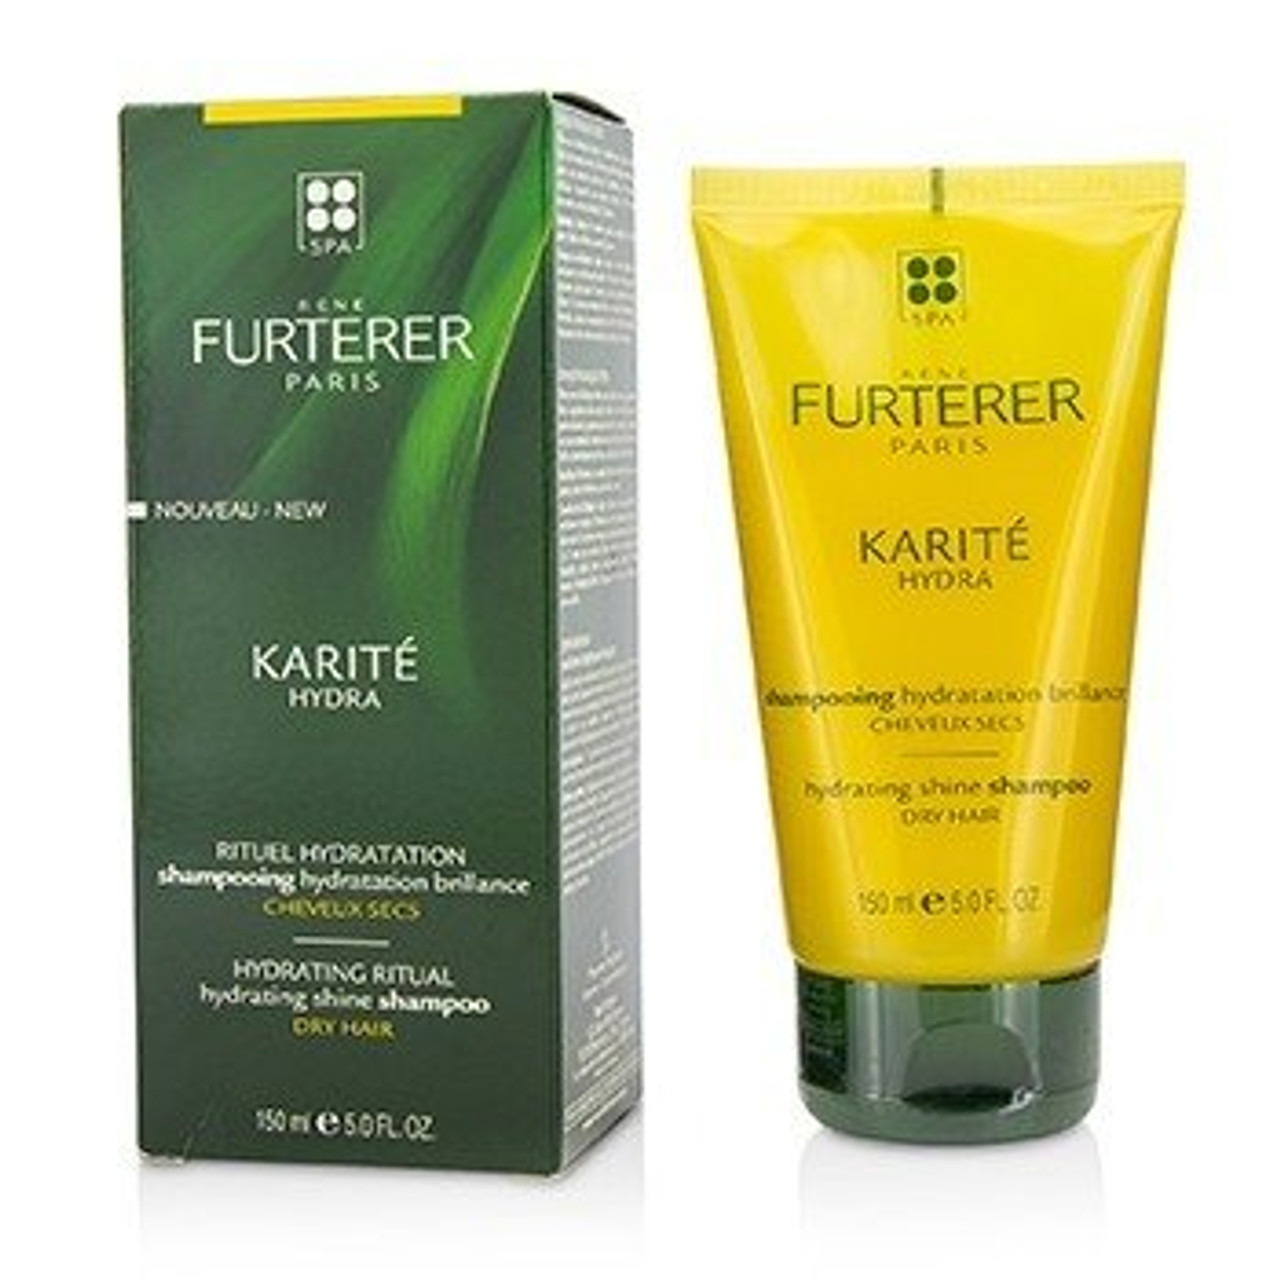 Rene Furterer Karite Hydra Shampoo 5 oz: box and tube